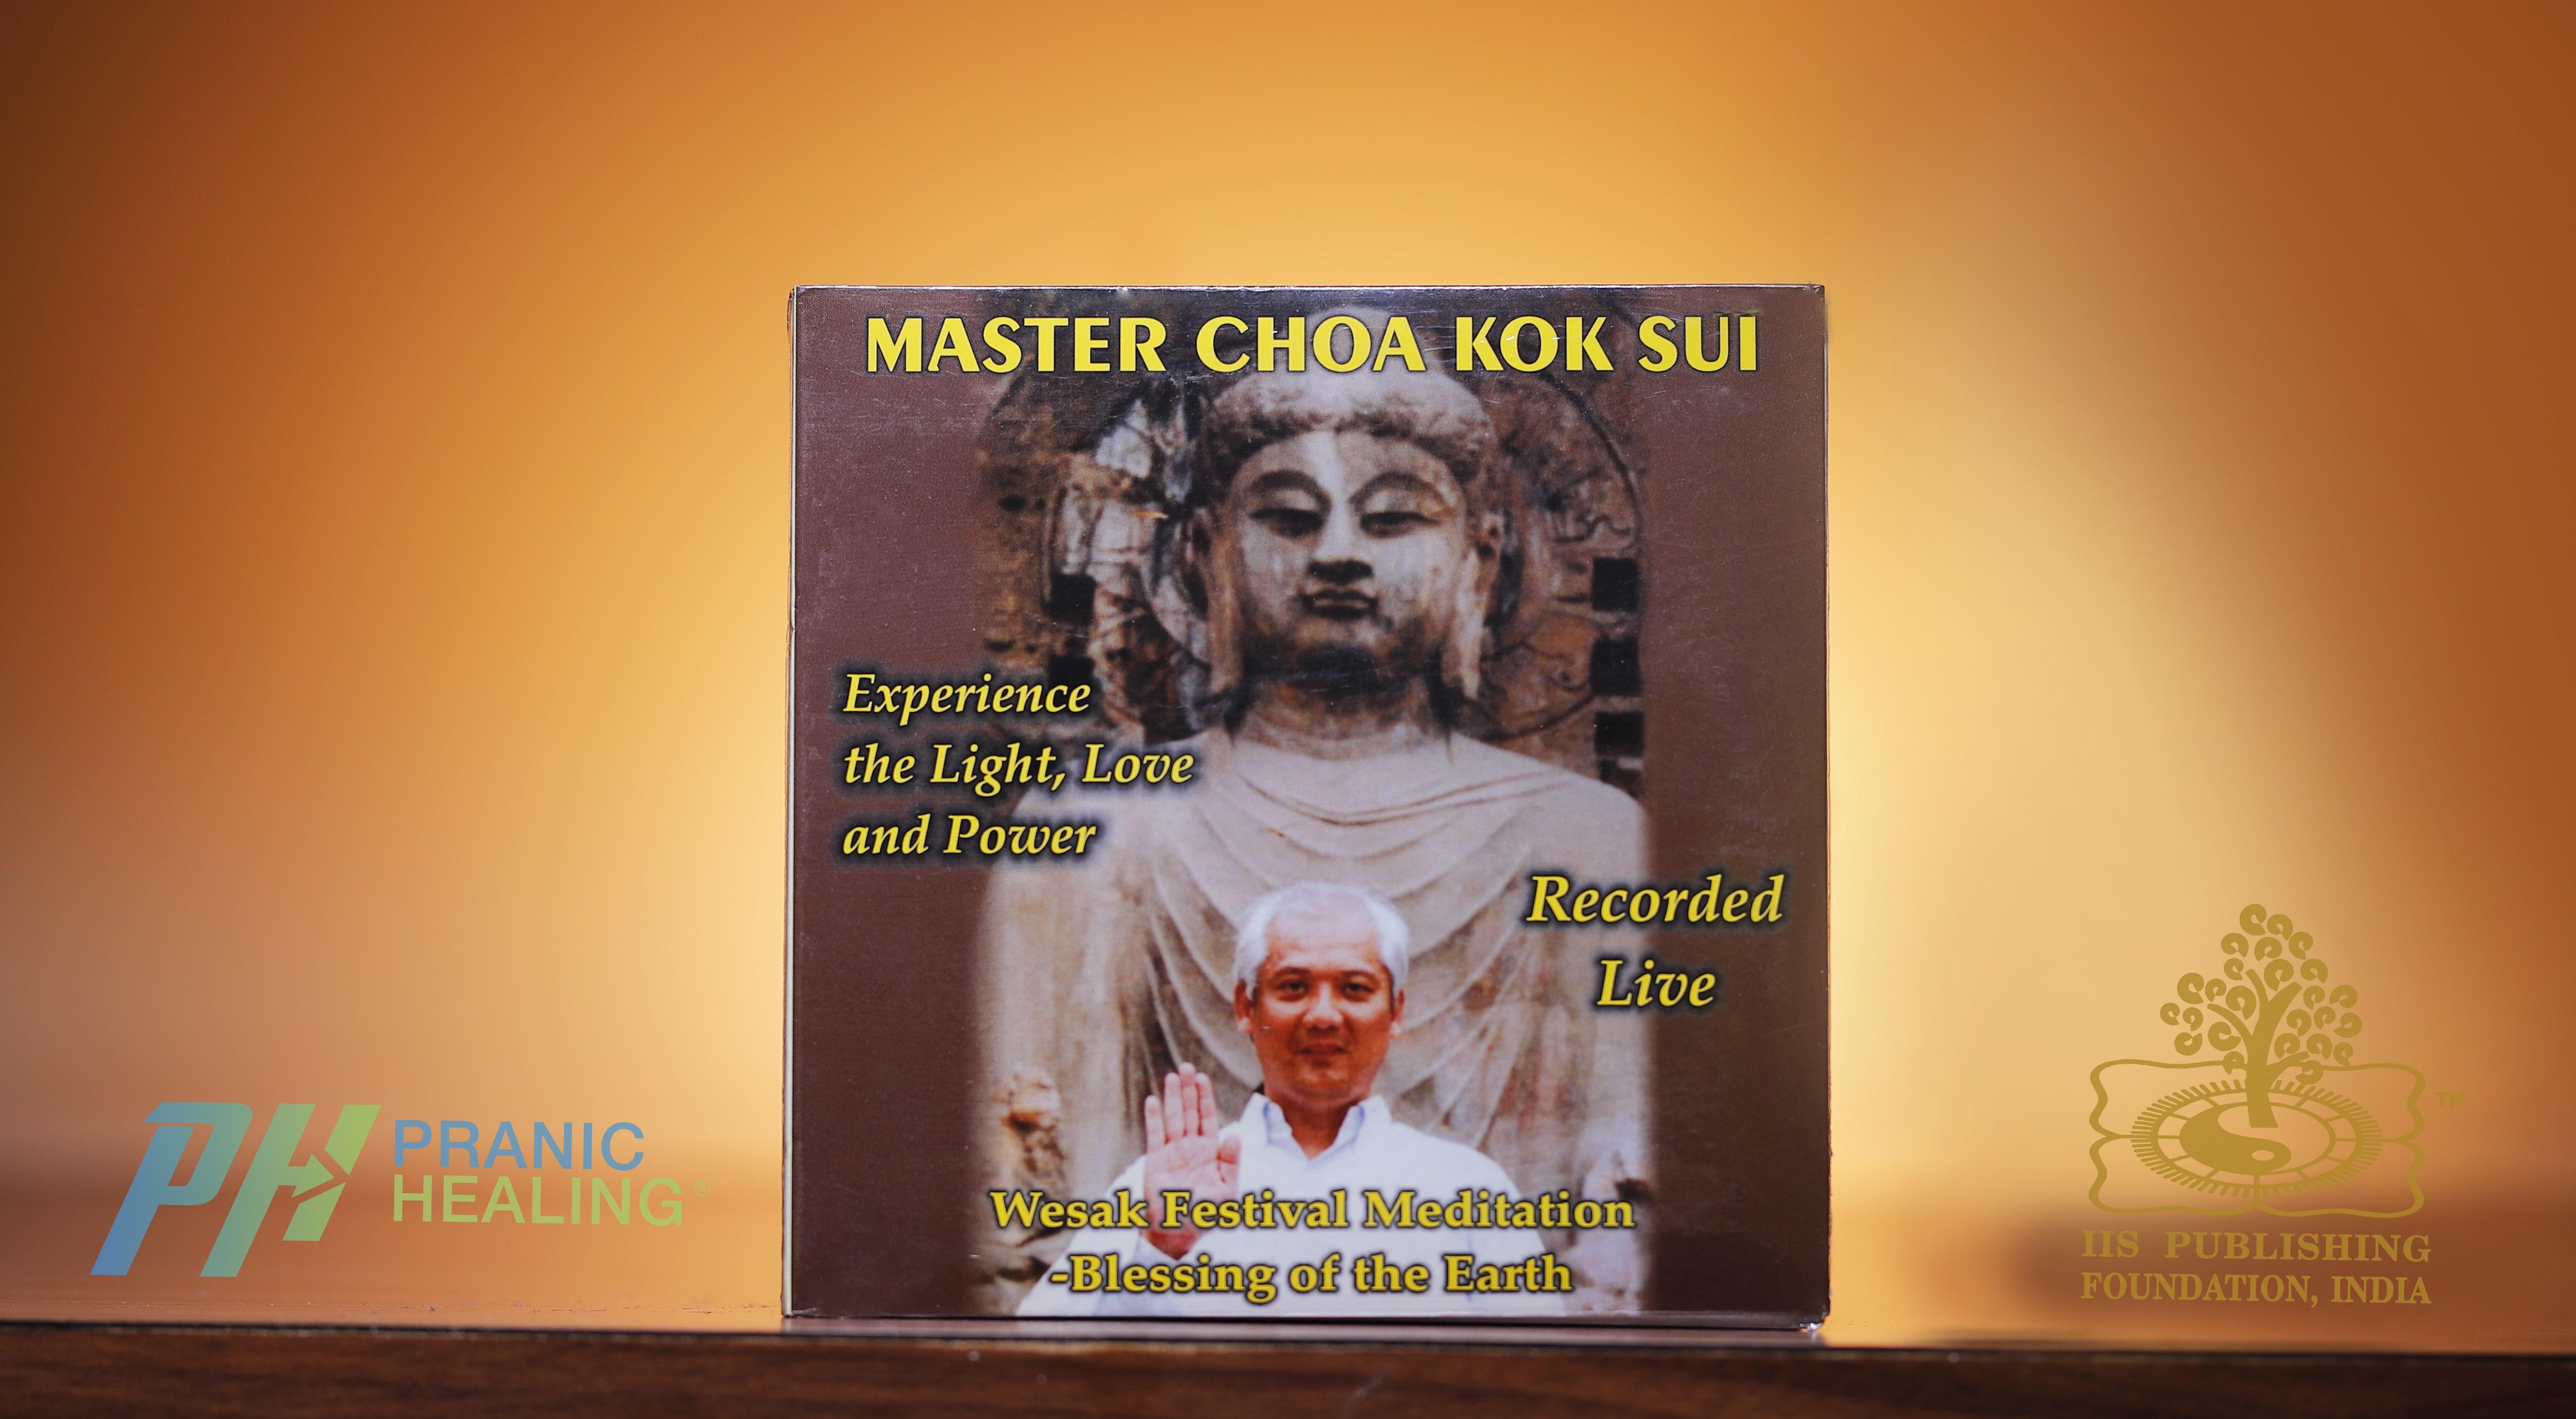 https://shop.pranichealingmumbai.com/products/wesak-festival-meditation-cd